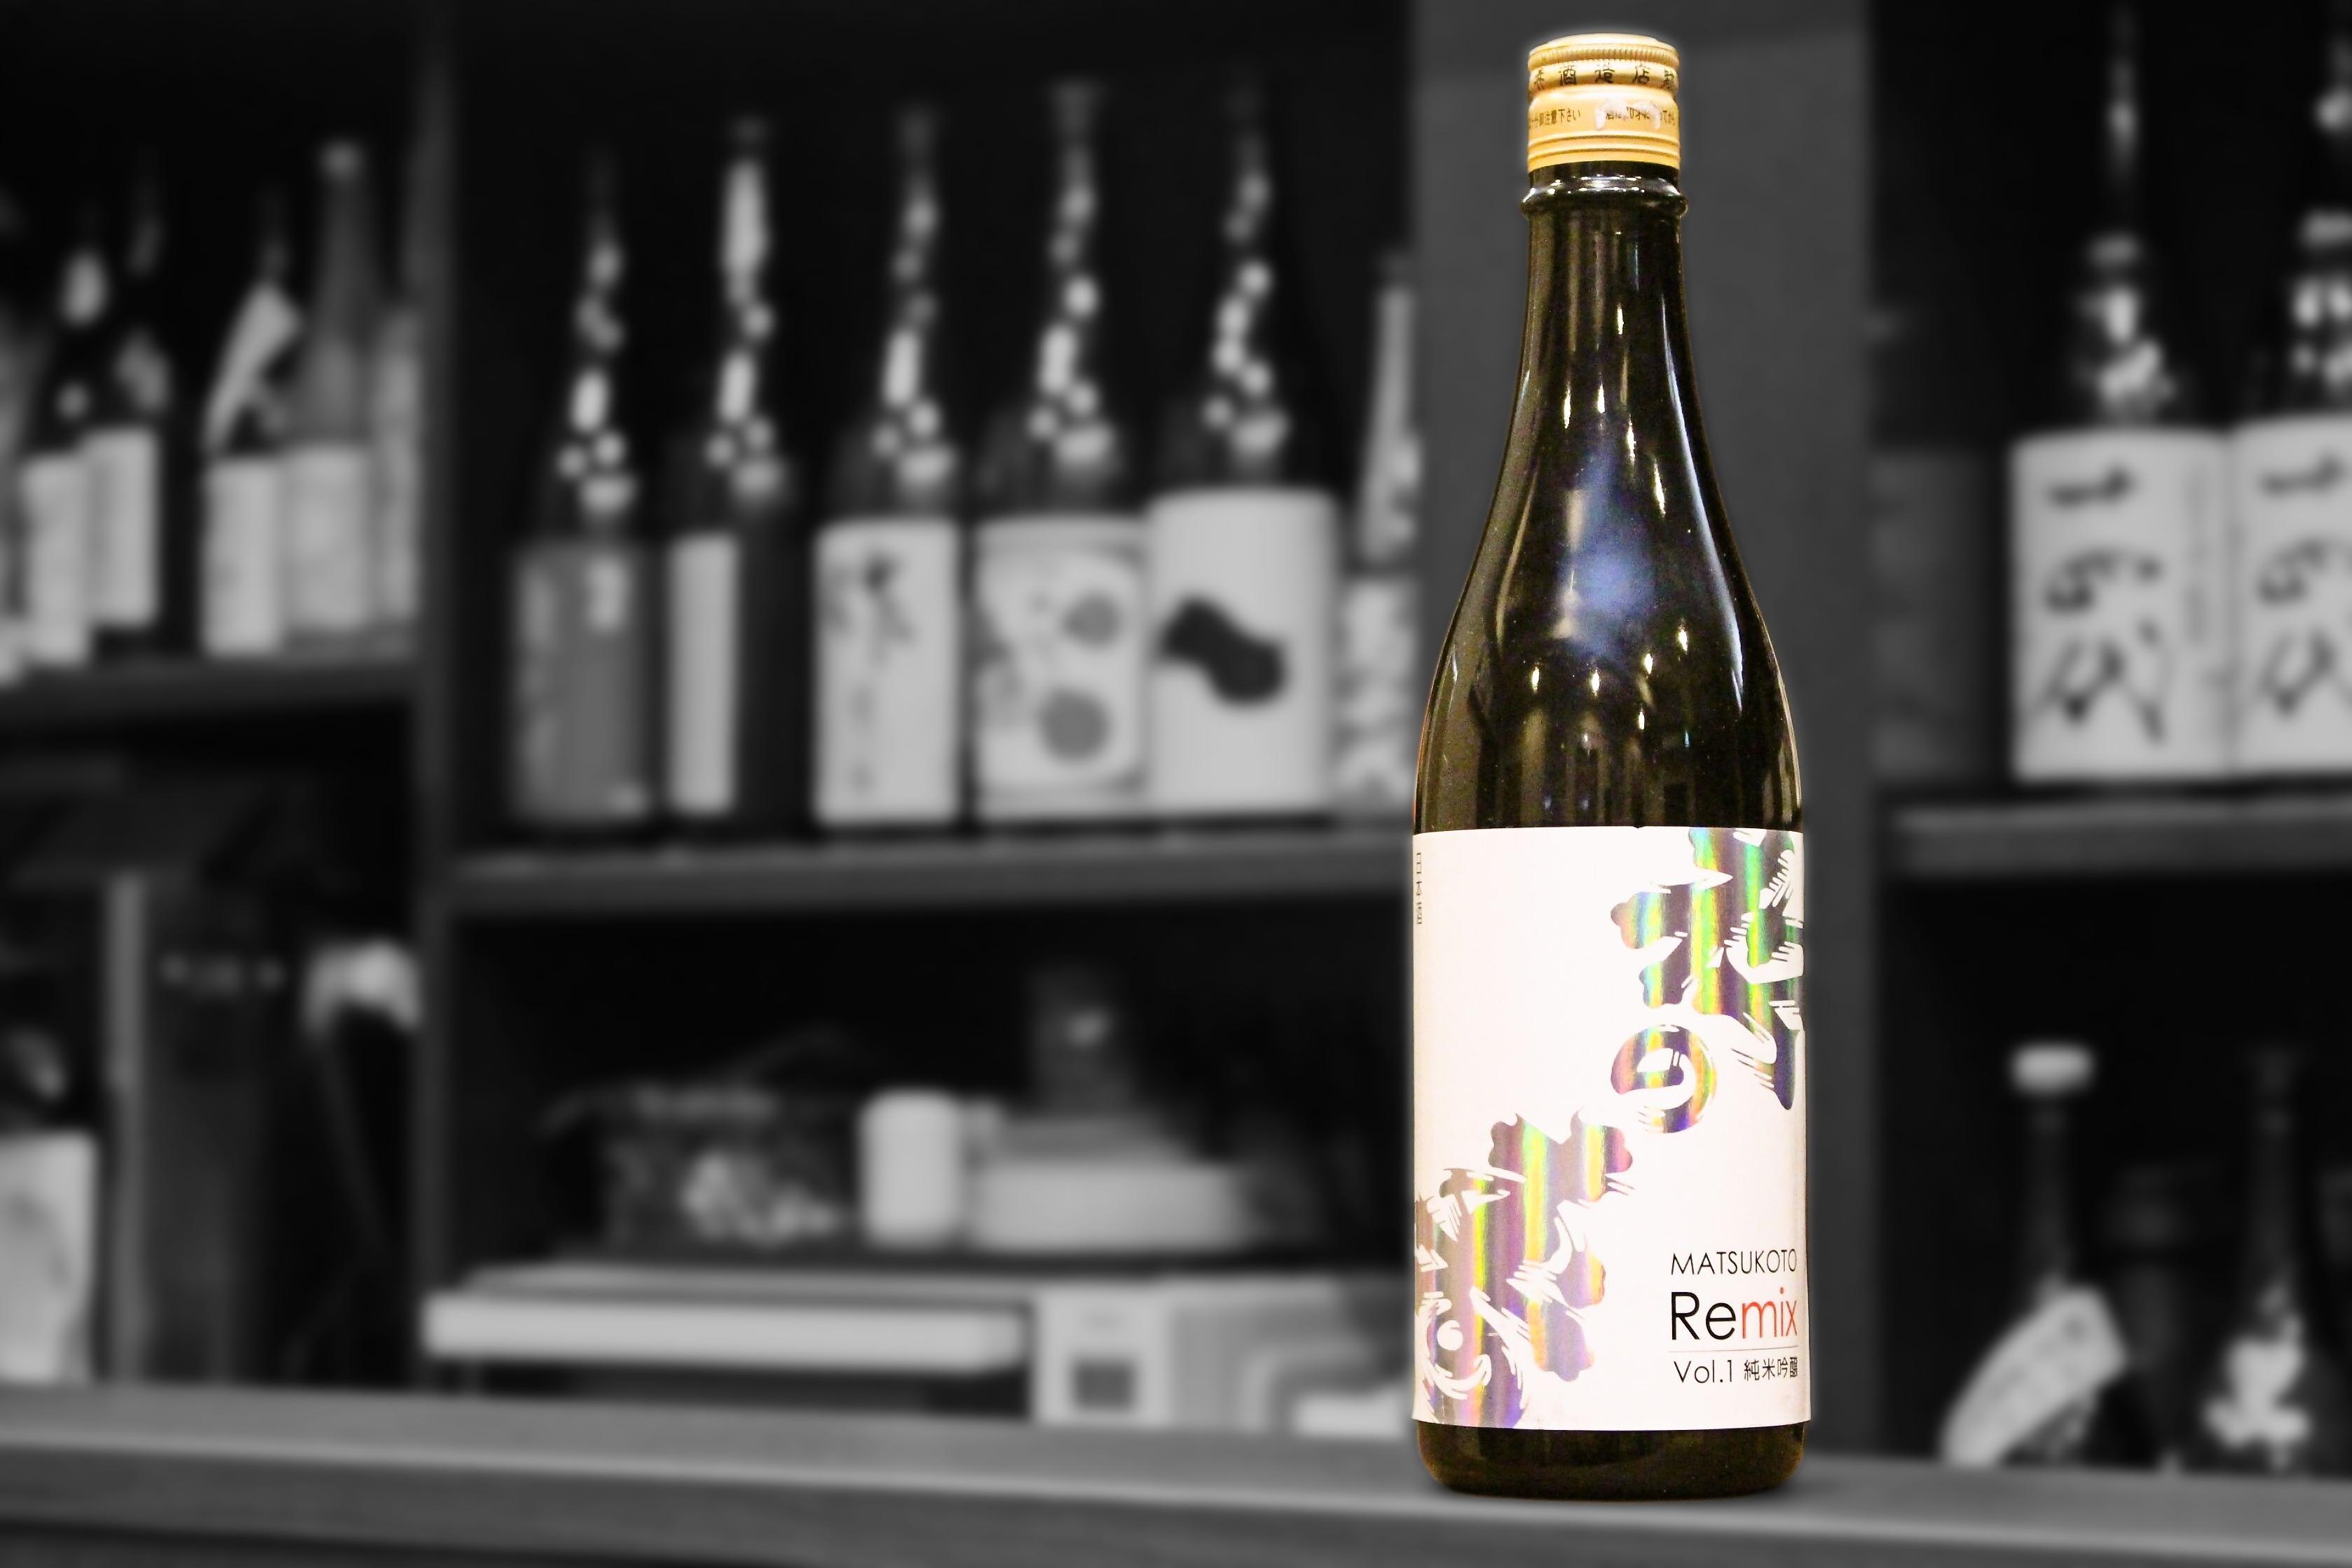 松の寿RemixVol1純米吟醸202010-001